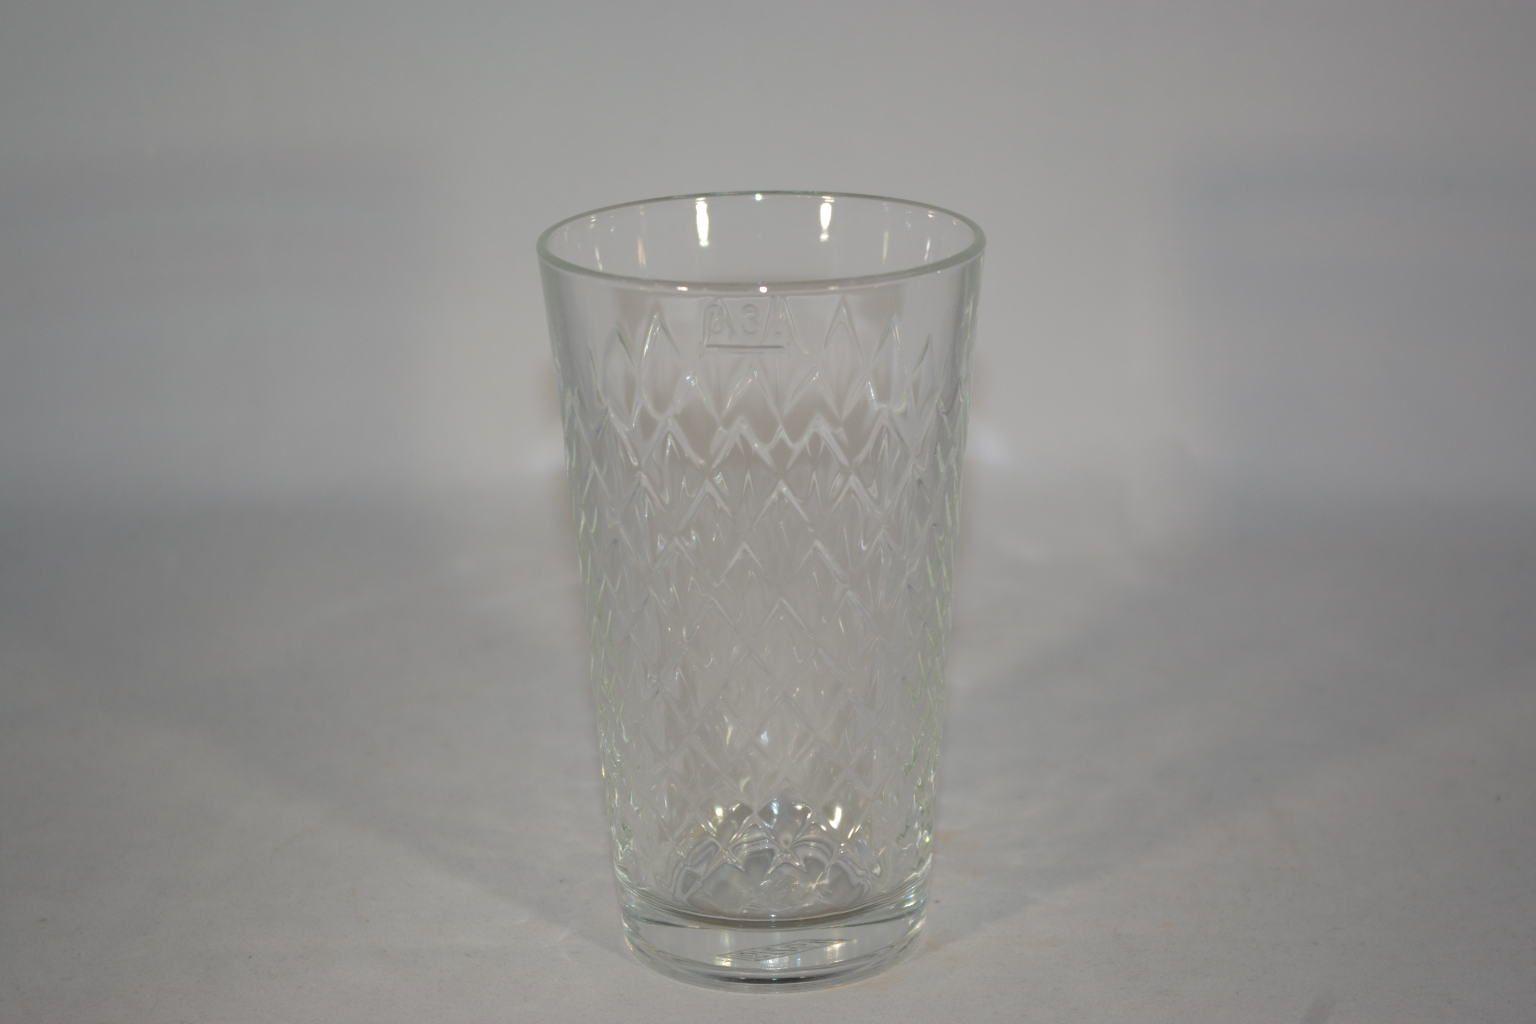 Bembel Shop Apfelweinglas 0,3 Liter - • Höhe: ca. 13,5 cm ...